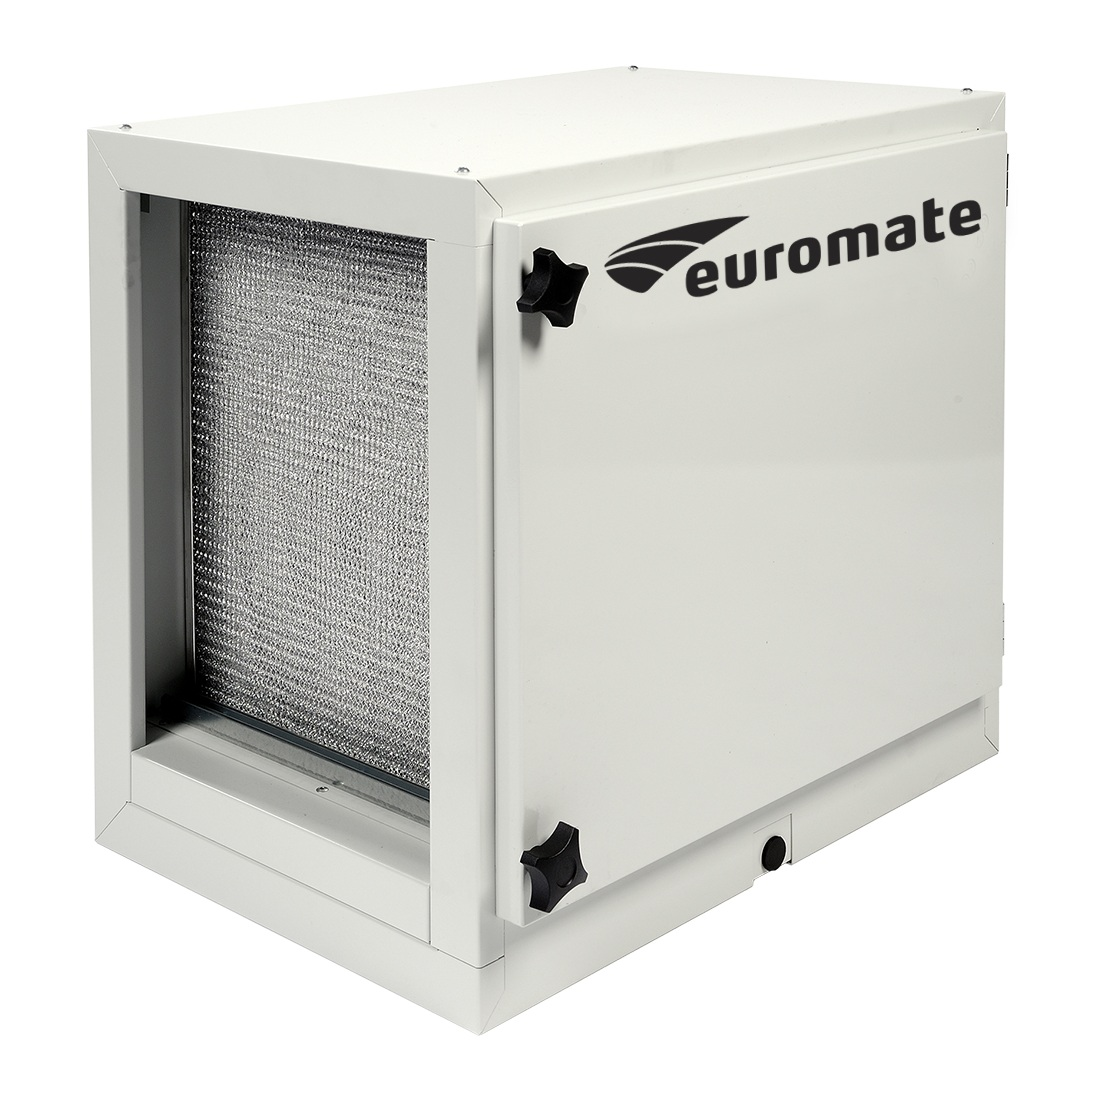 Профессиональные воздухоочистители | Воздухоочиститель Euromate (Plymovent) SFС-50